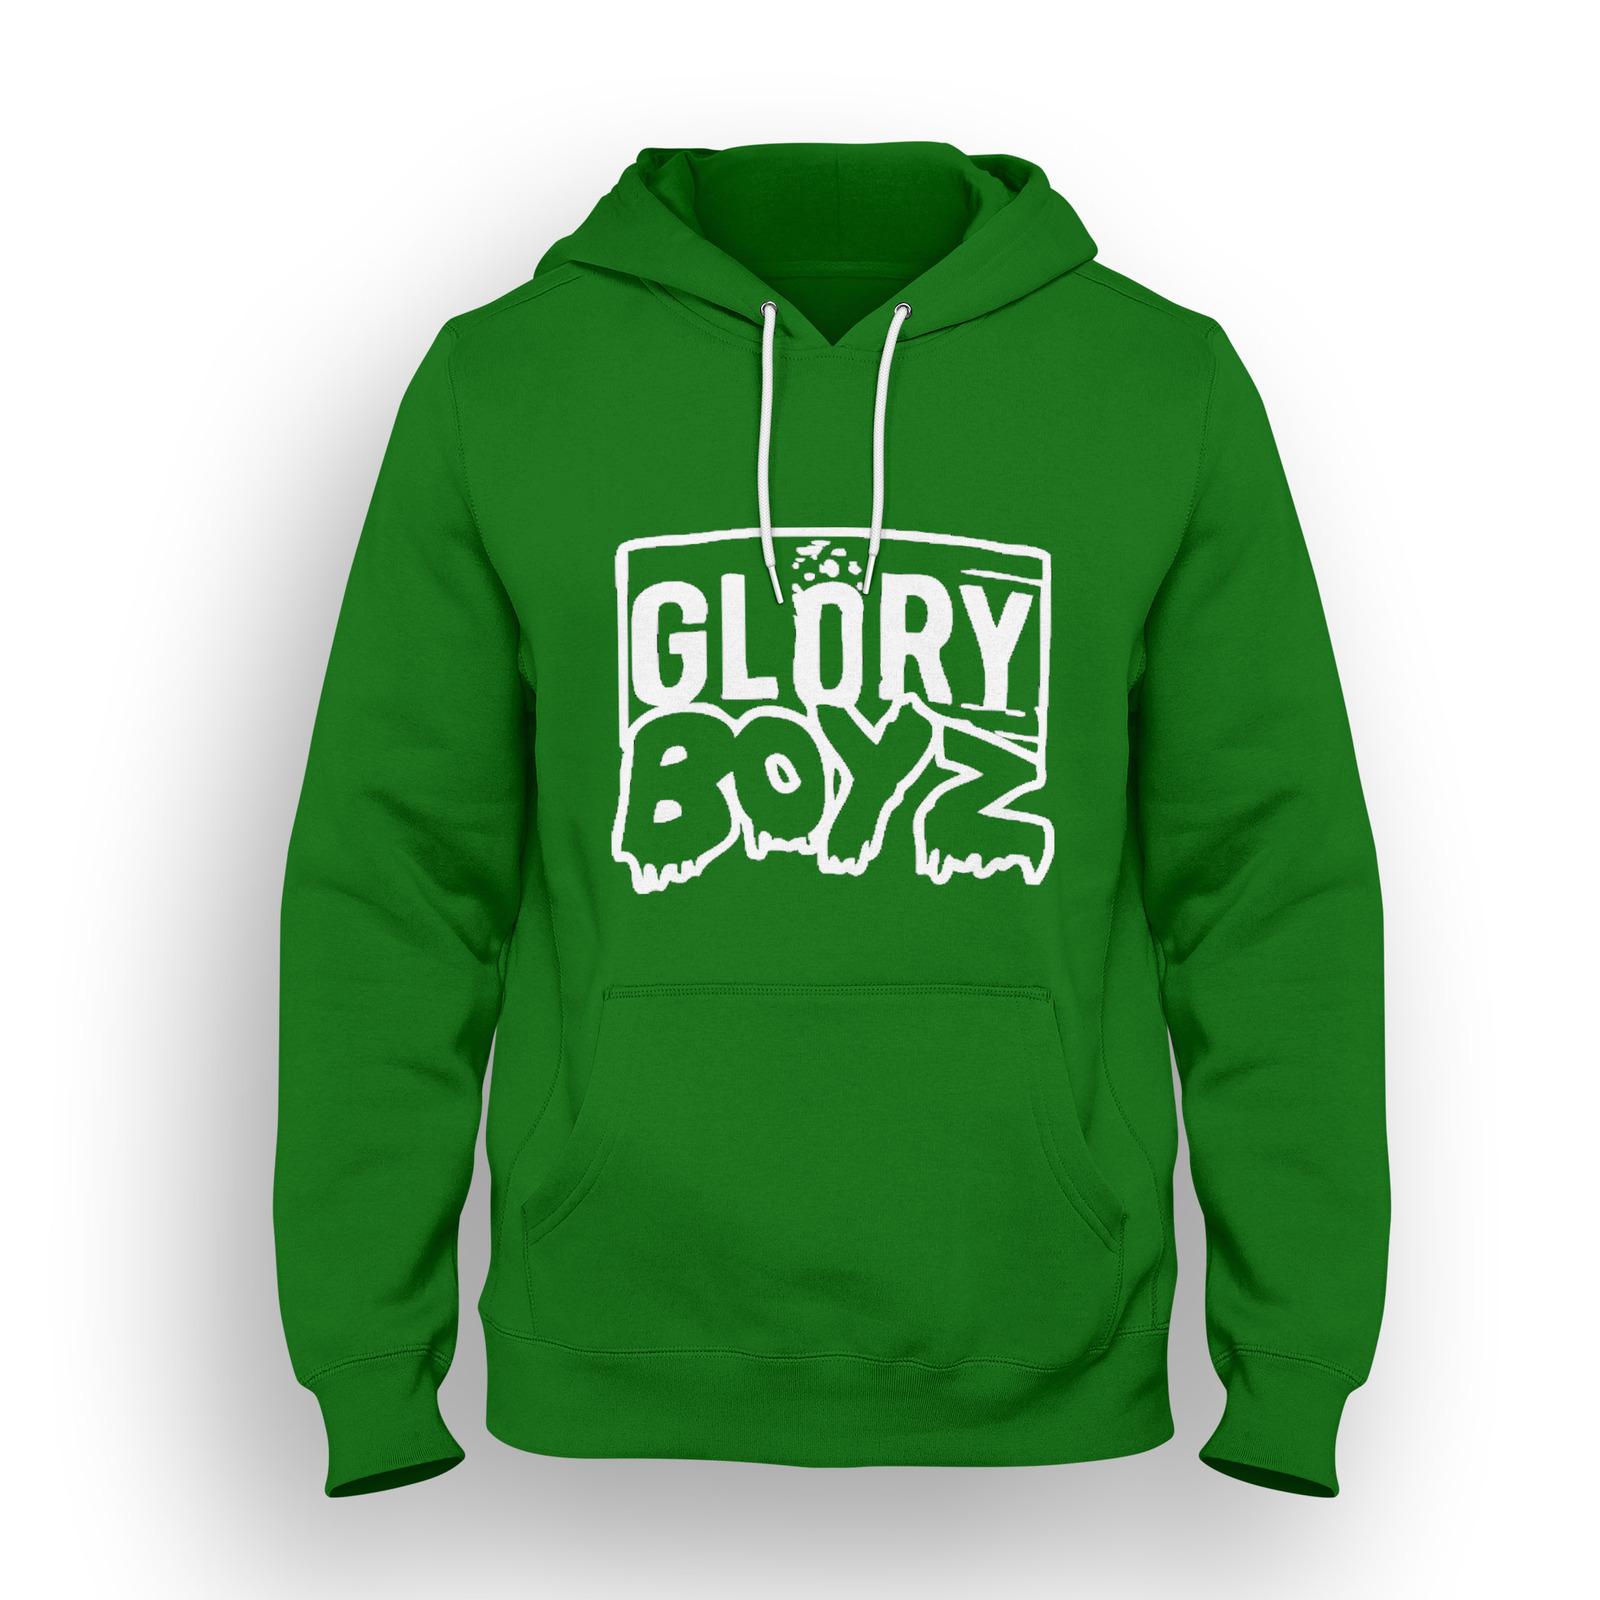 Glory Boyz Hoodie Grey - Cardigan With Buttons